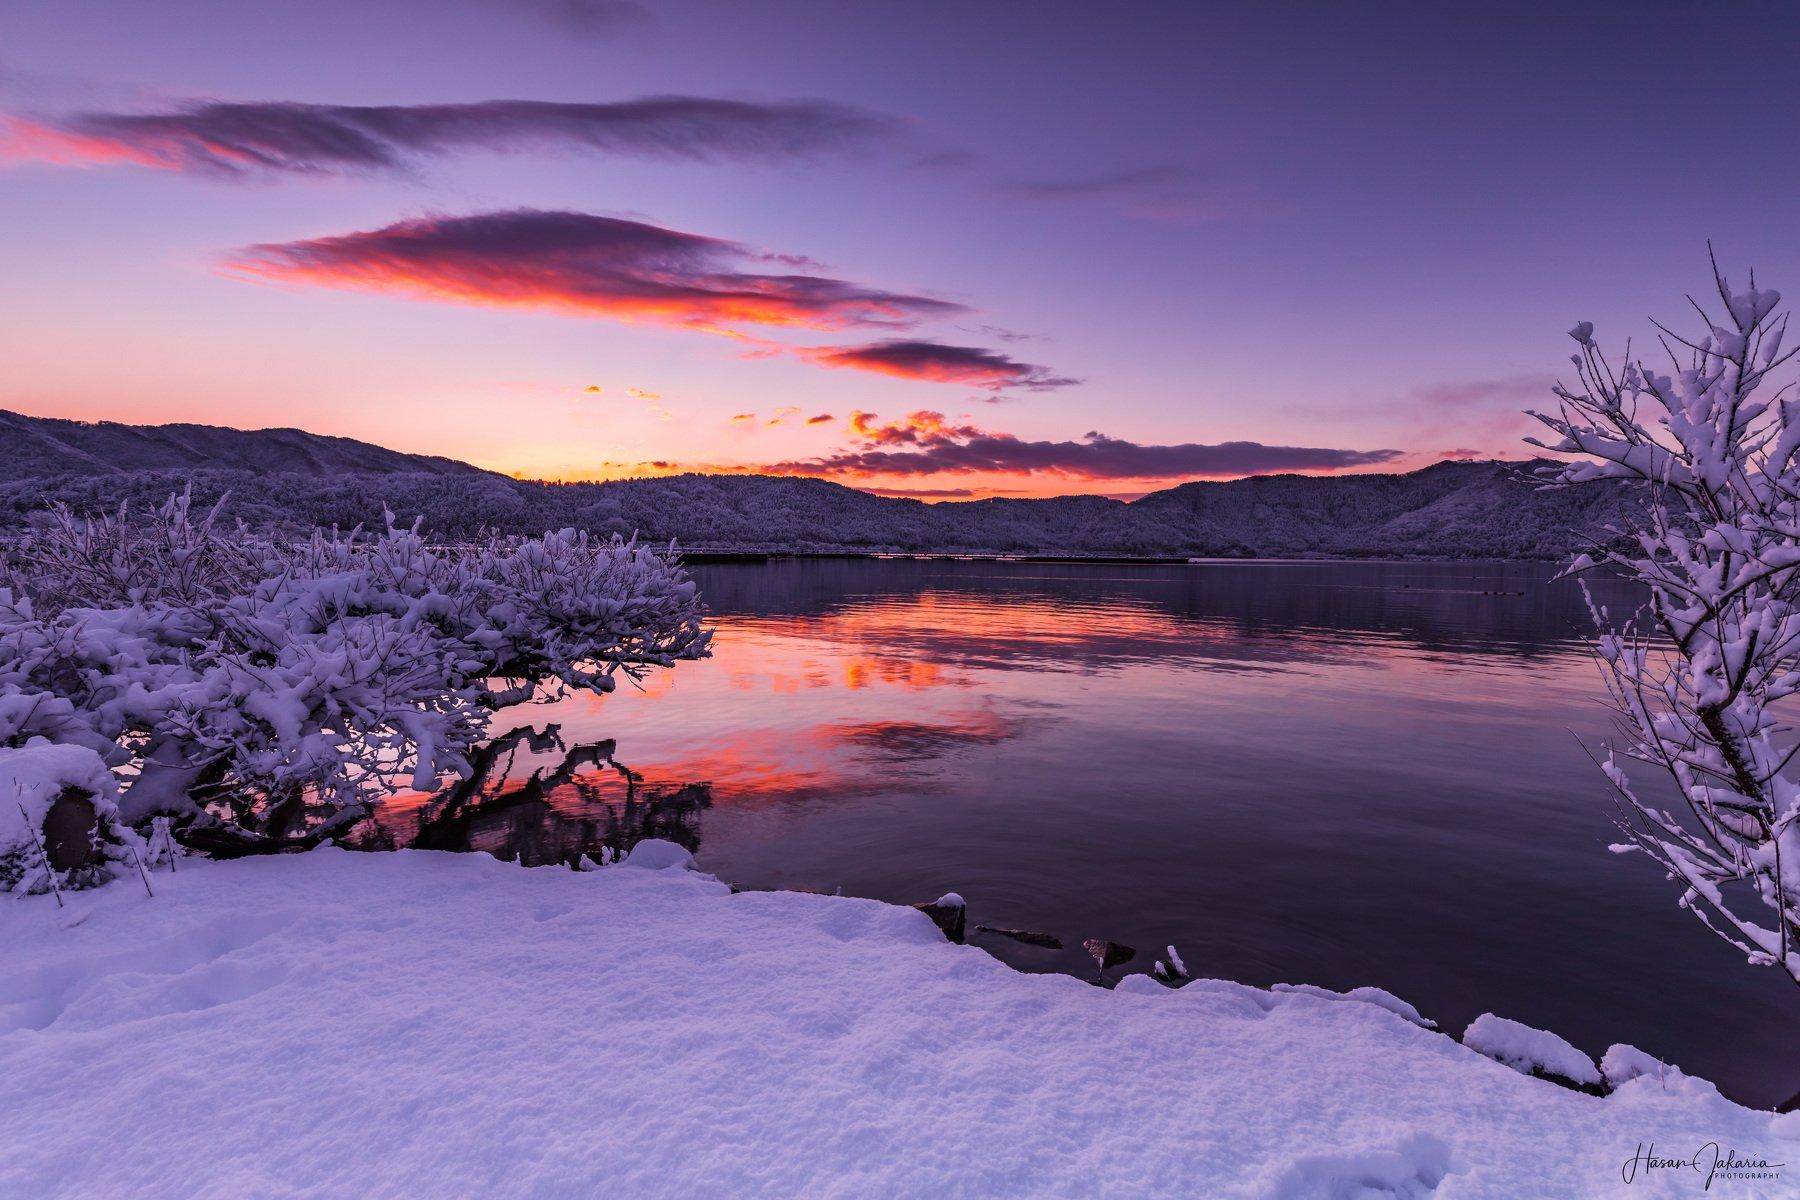 winter snow morning lake landscape shiga japan, Hasan Jakaria